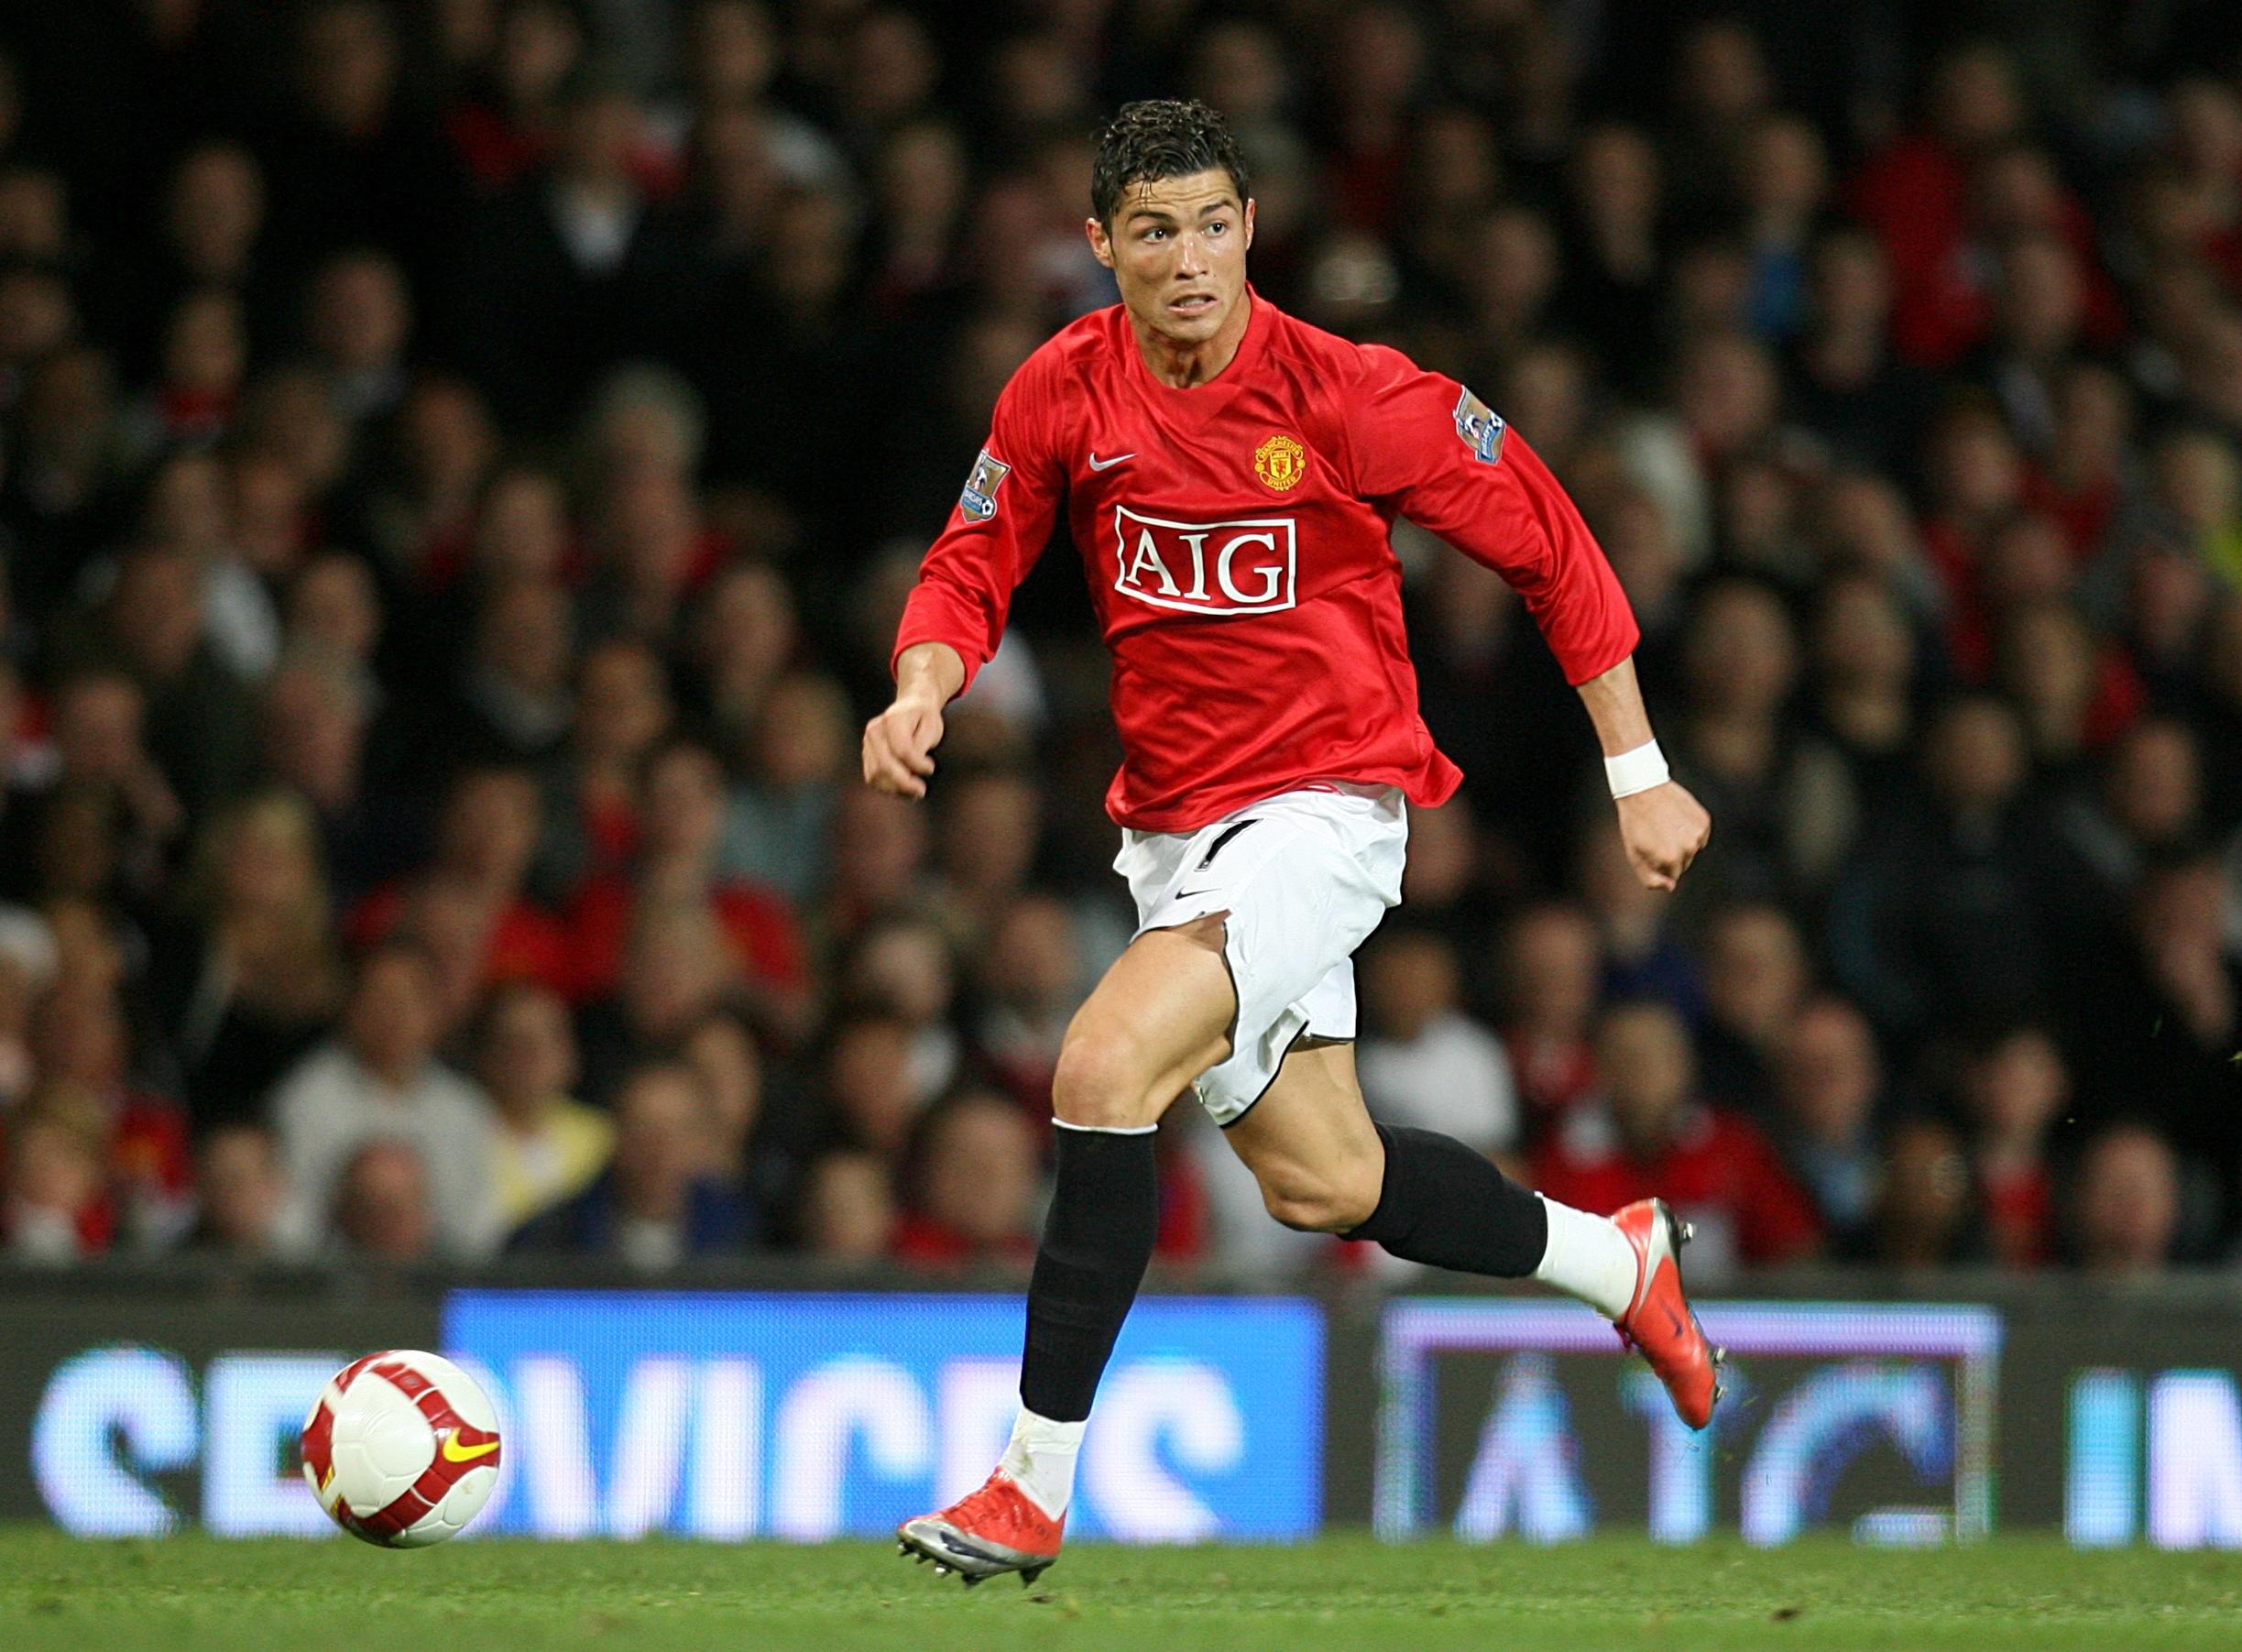 Cristiano Ronaldo enjoyed great success at Manchester United